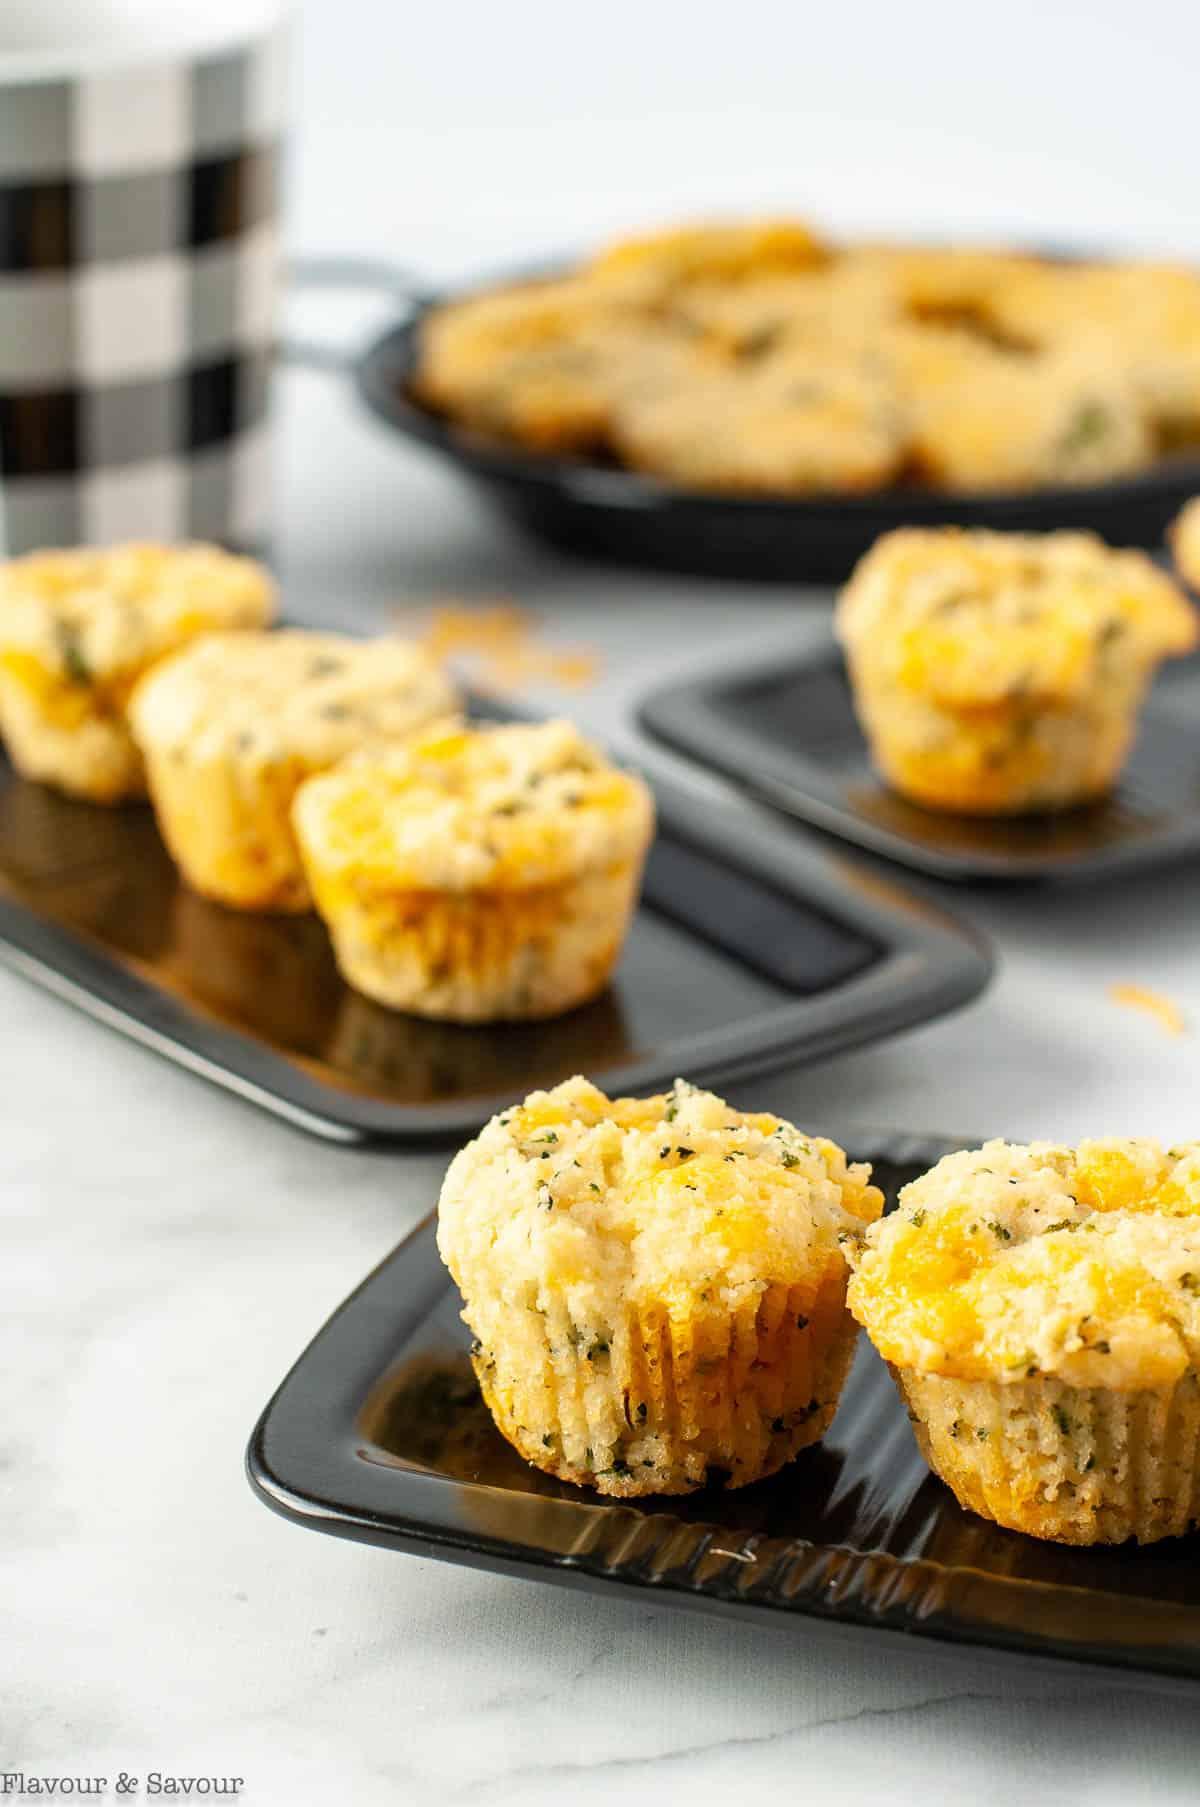 Mini Broccoli Cheese Muffins on small black plates.